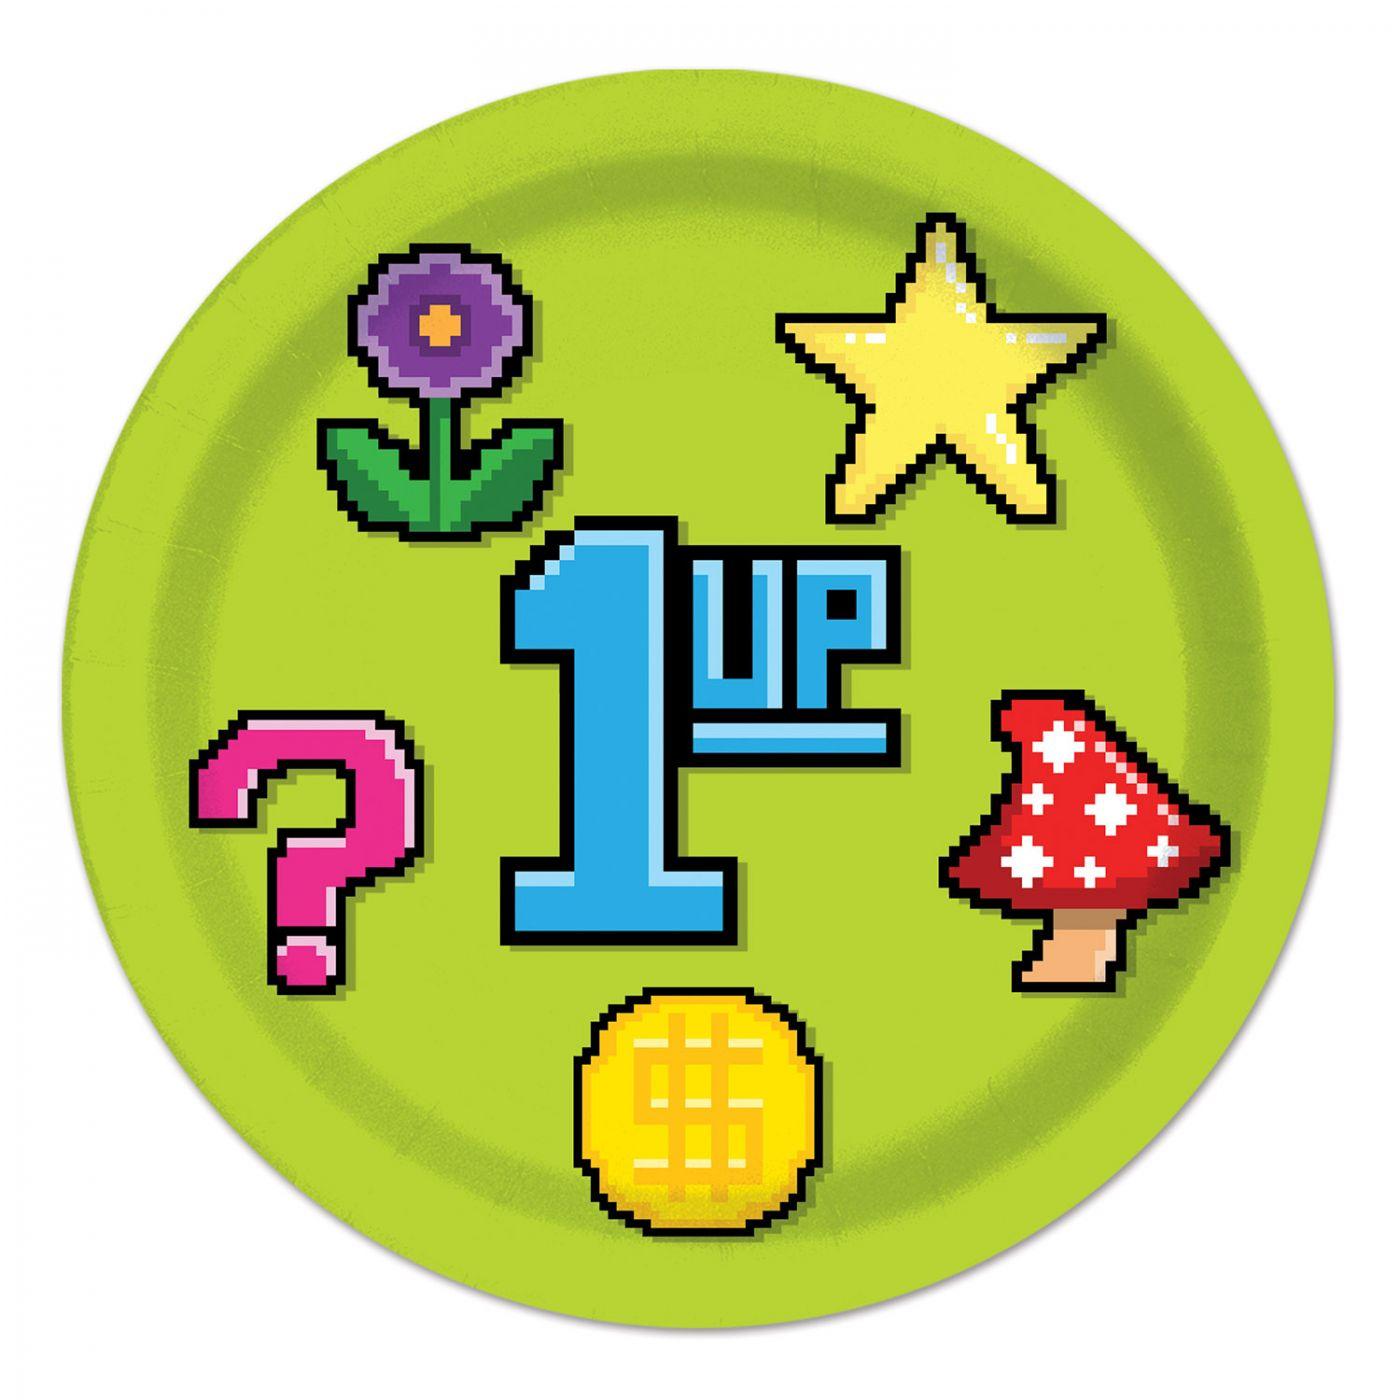 8-Bit Plates image